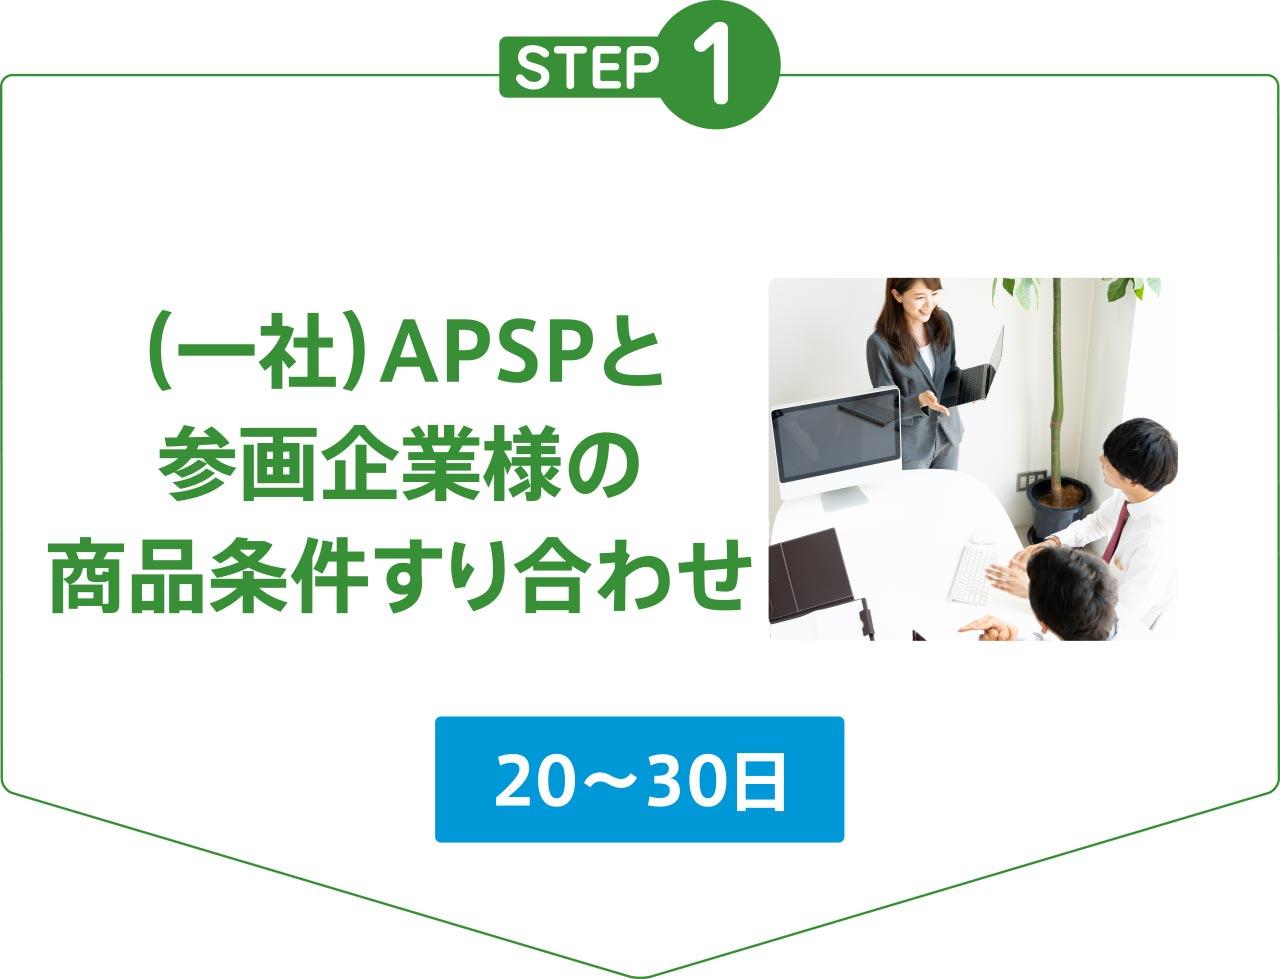 STEP1.(一社)APSPと参画企業様の商品条件すり合わせ